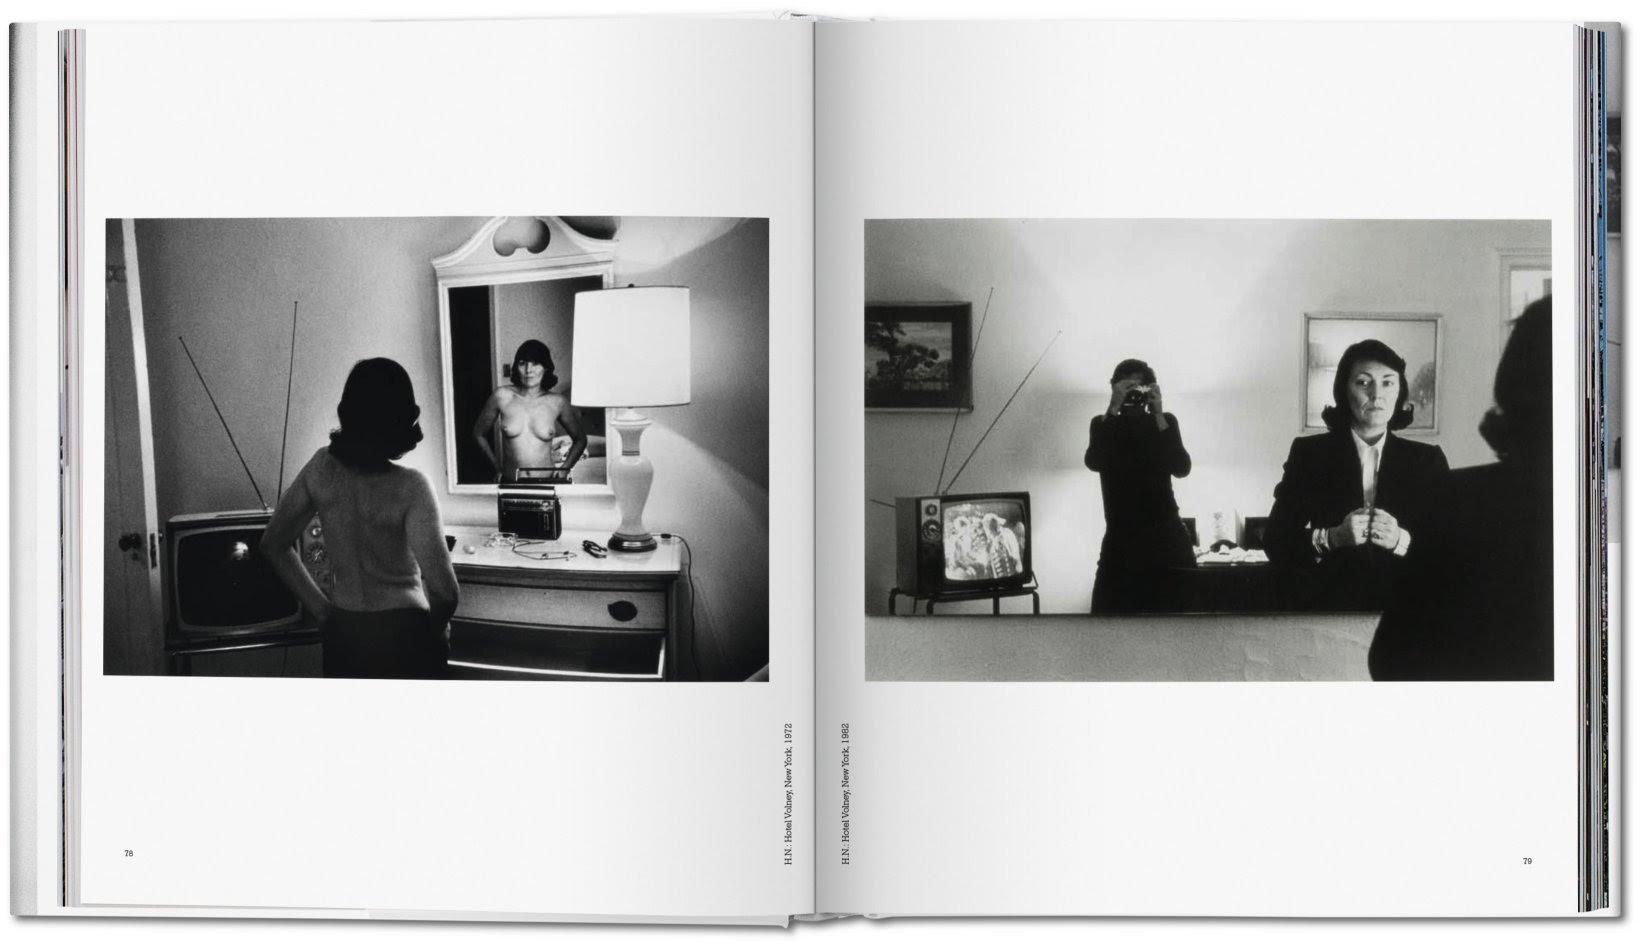 foto: Helmut Newton - June Newton uit boek Us and Them